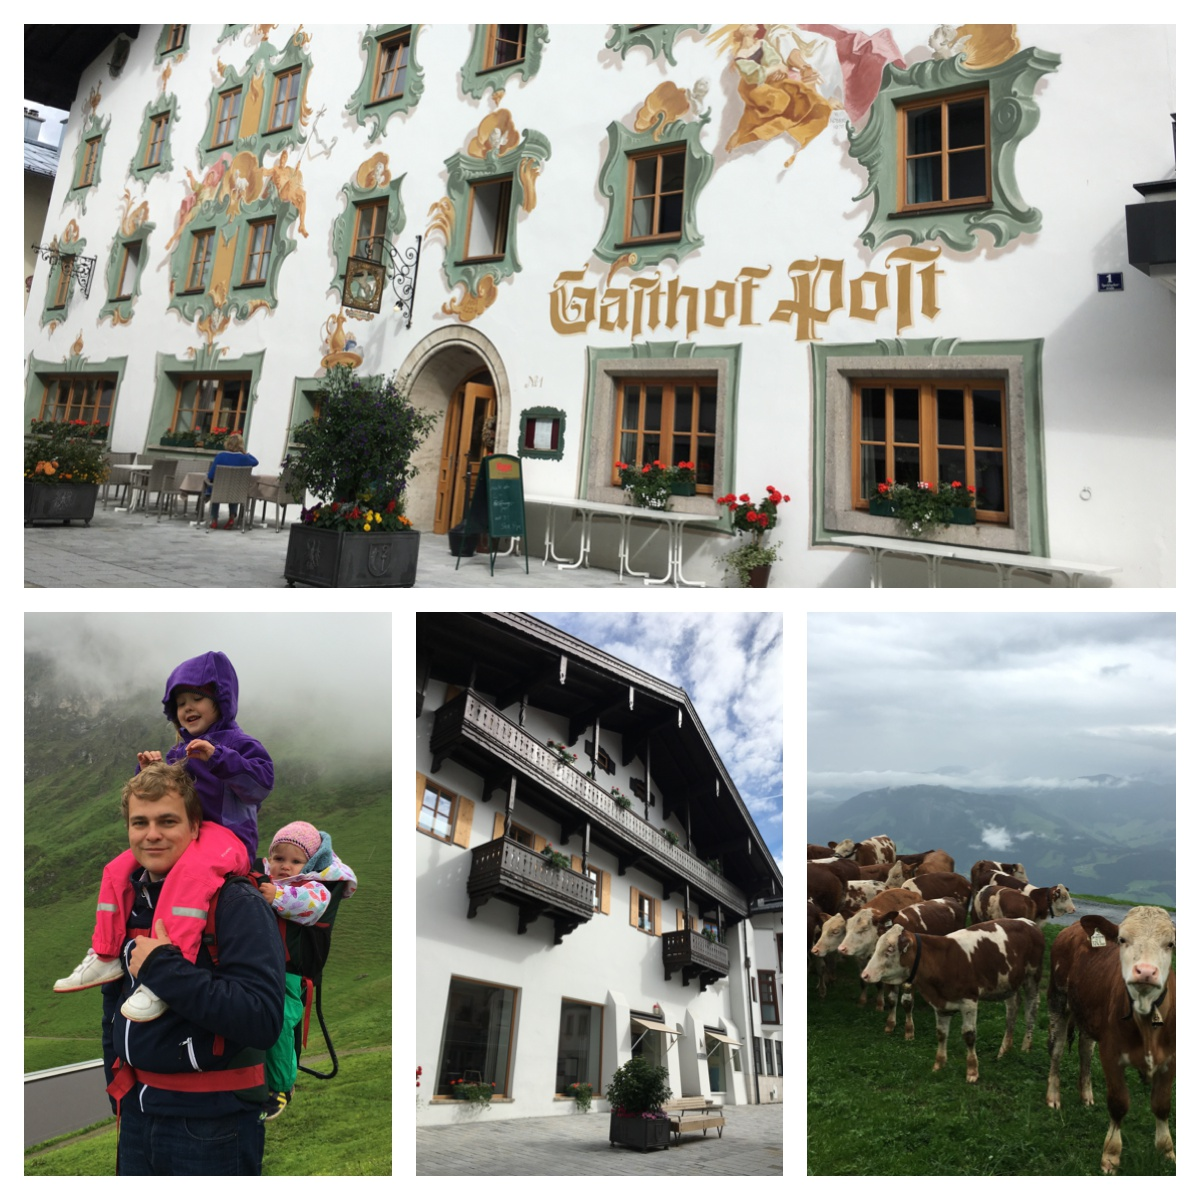 Unser Tipp: Tiroler Bergsommer in Sankt Johann im Hotel & Wirtshaus Post